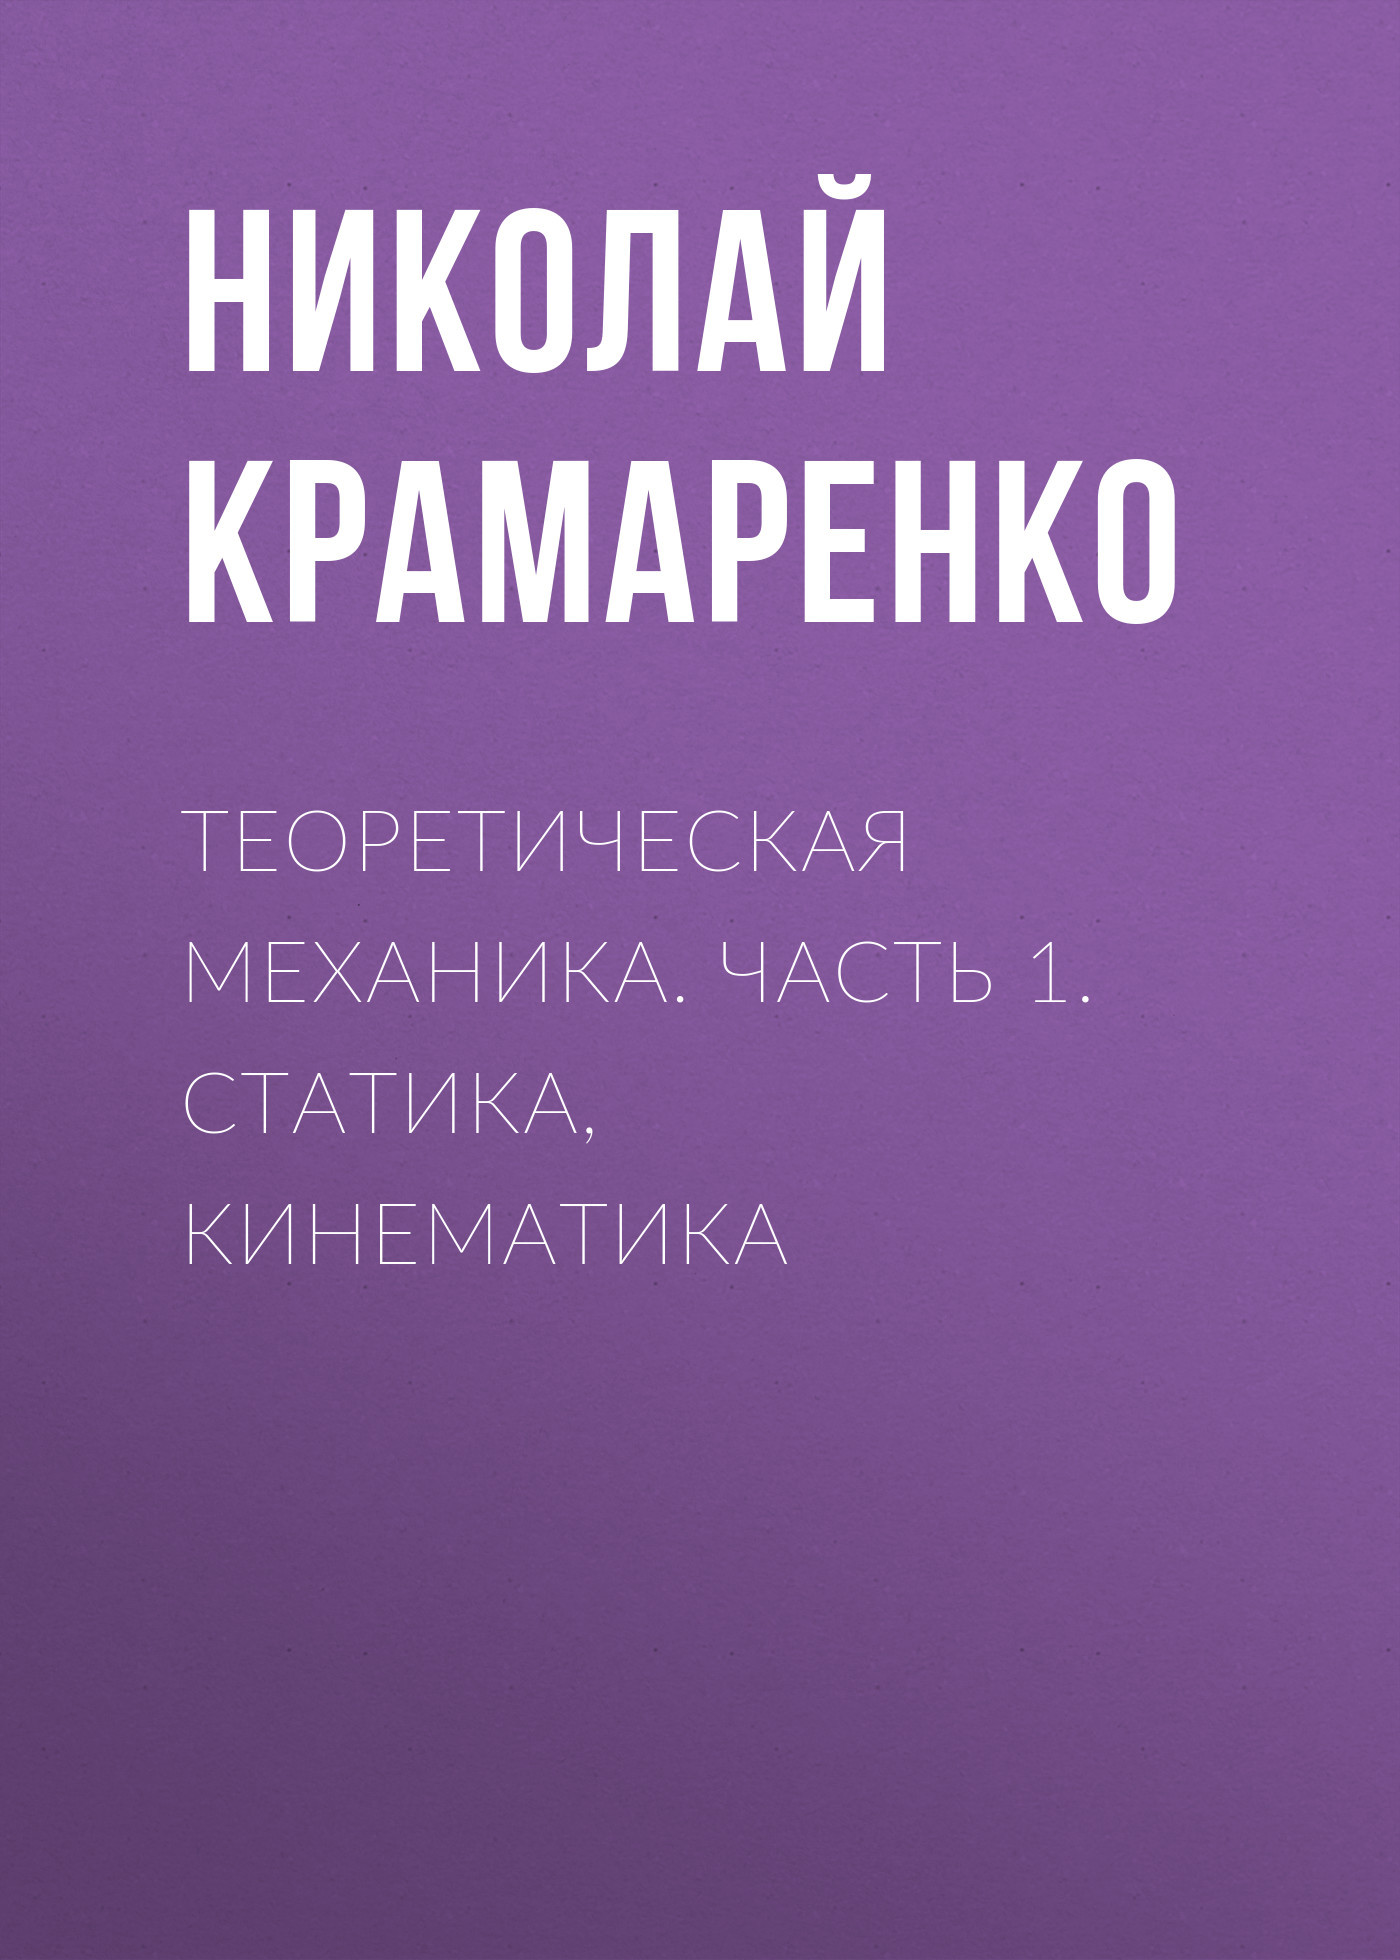 Николай Крамаренко бесплатно